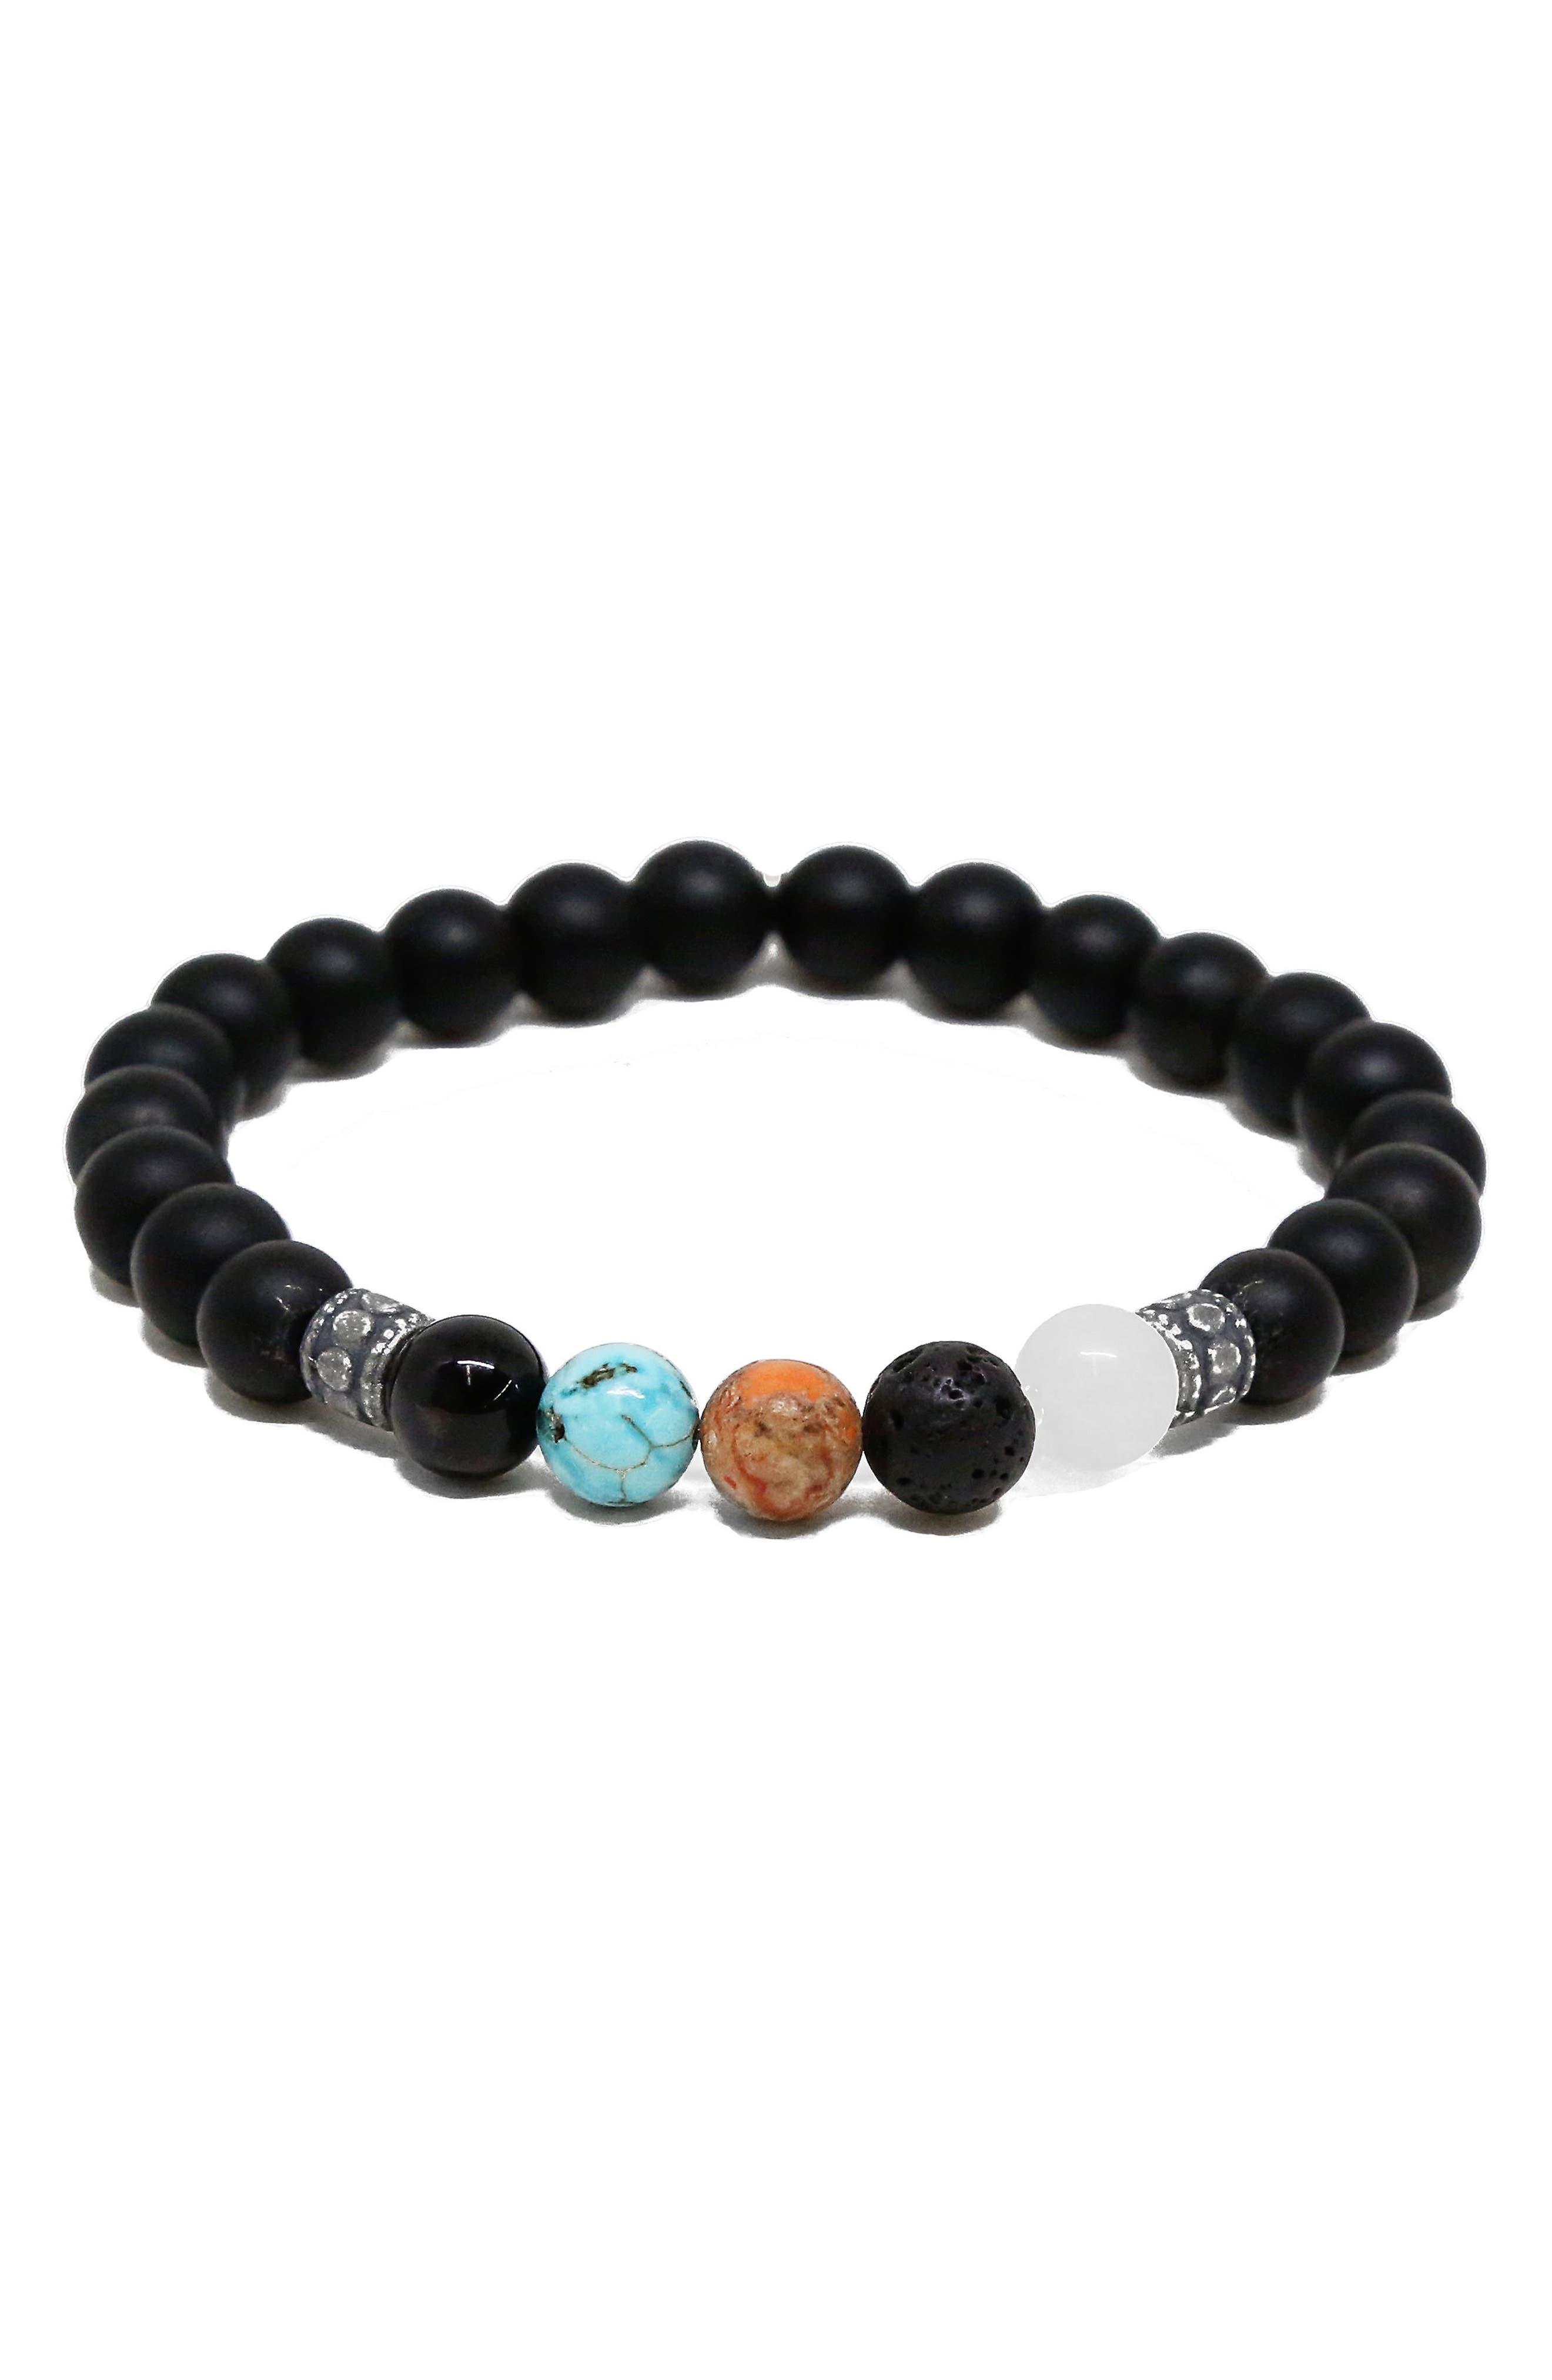 Stone Bead Bracelet,                         Main,                         color, Black/ Agate